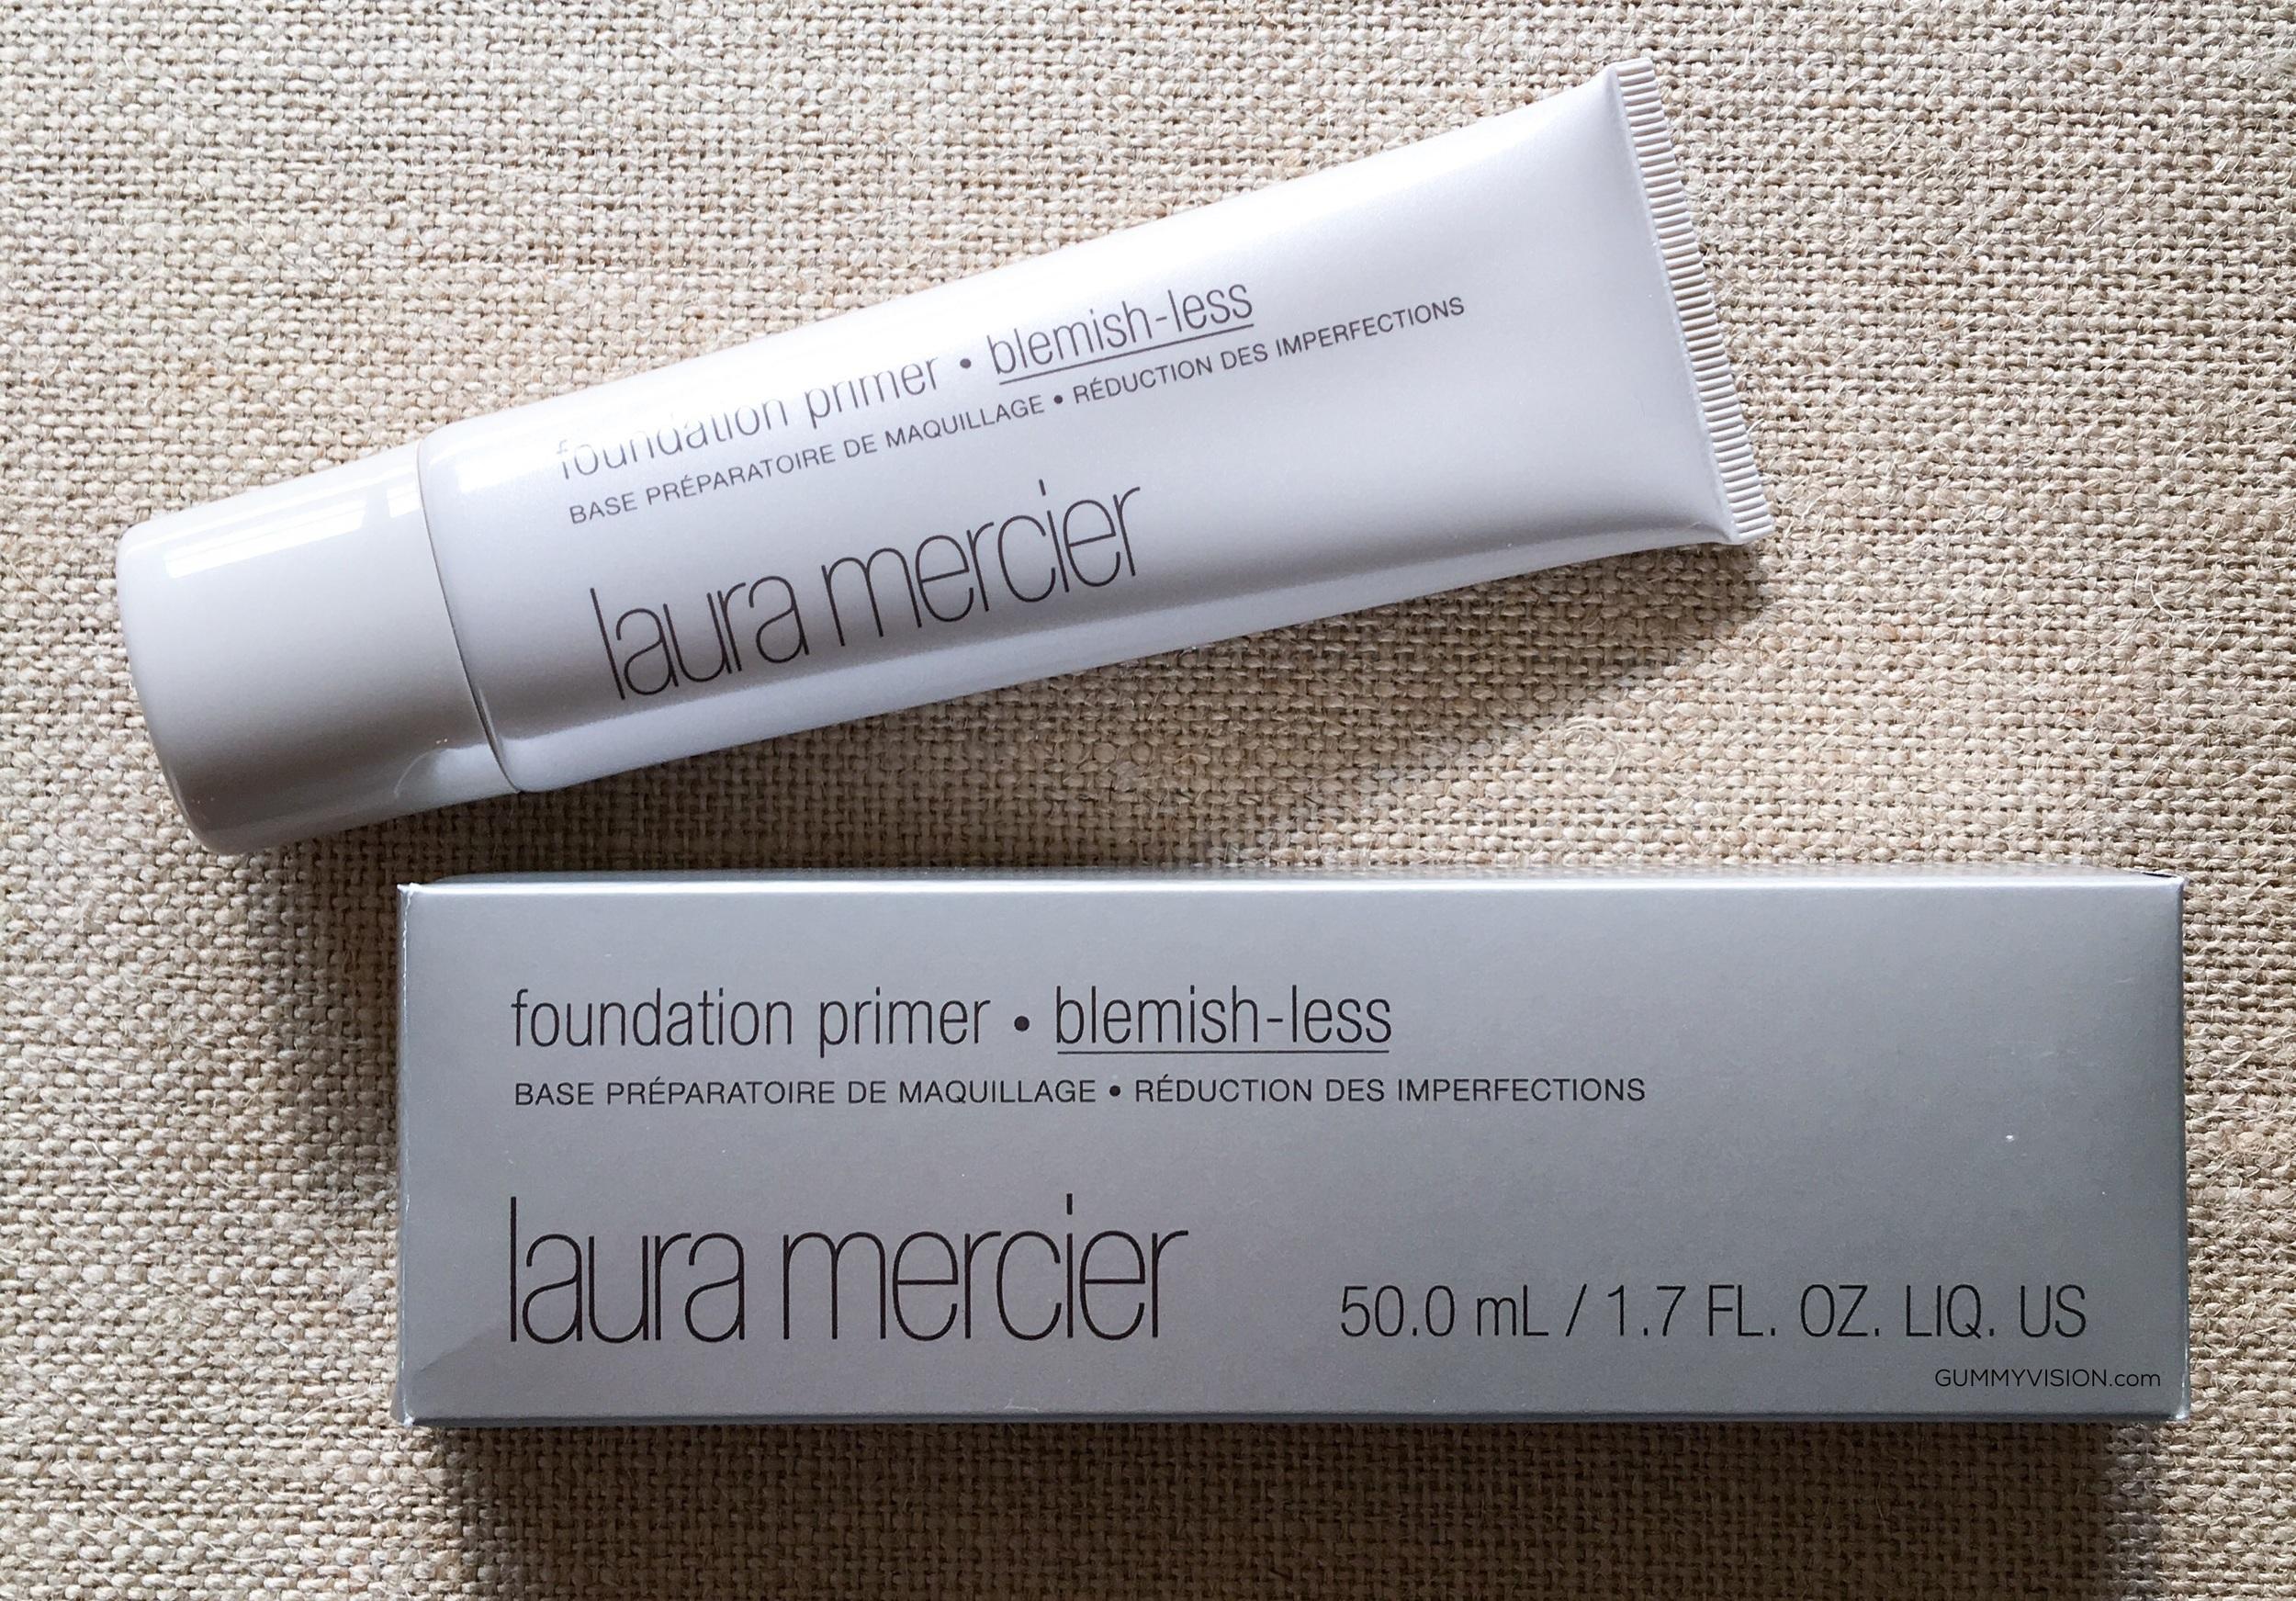 Laura Mercier Foundation Primer Blemish-less